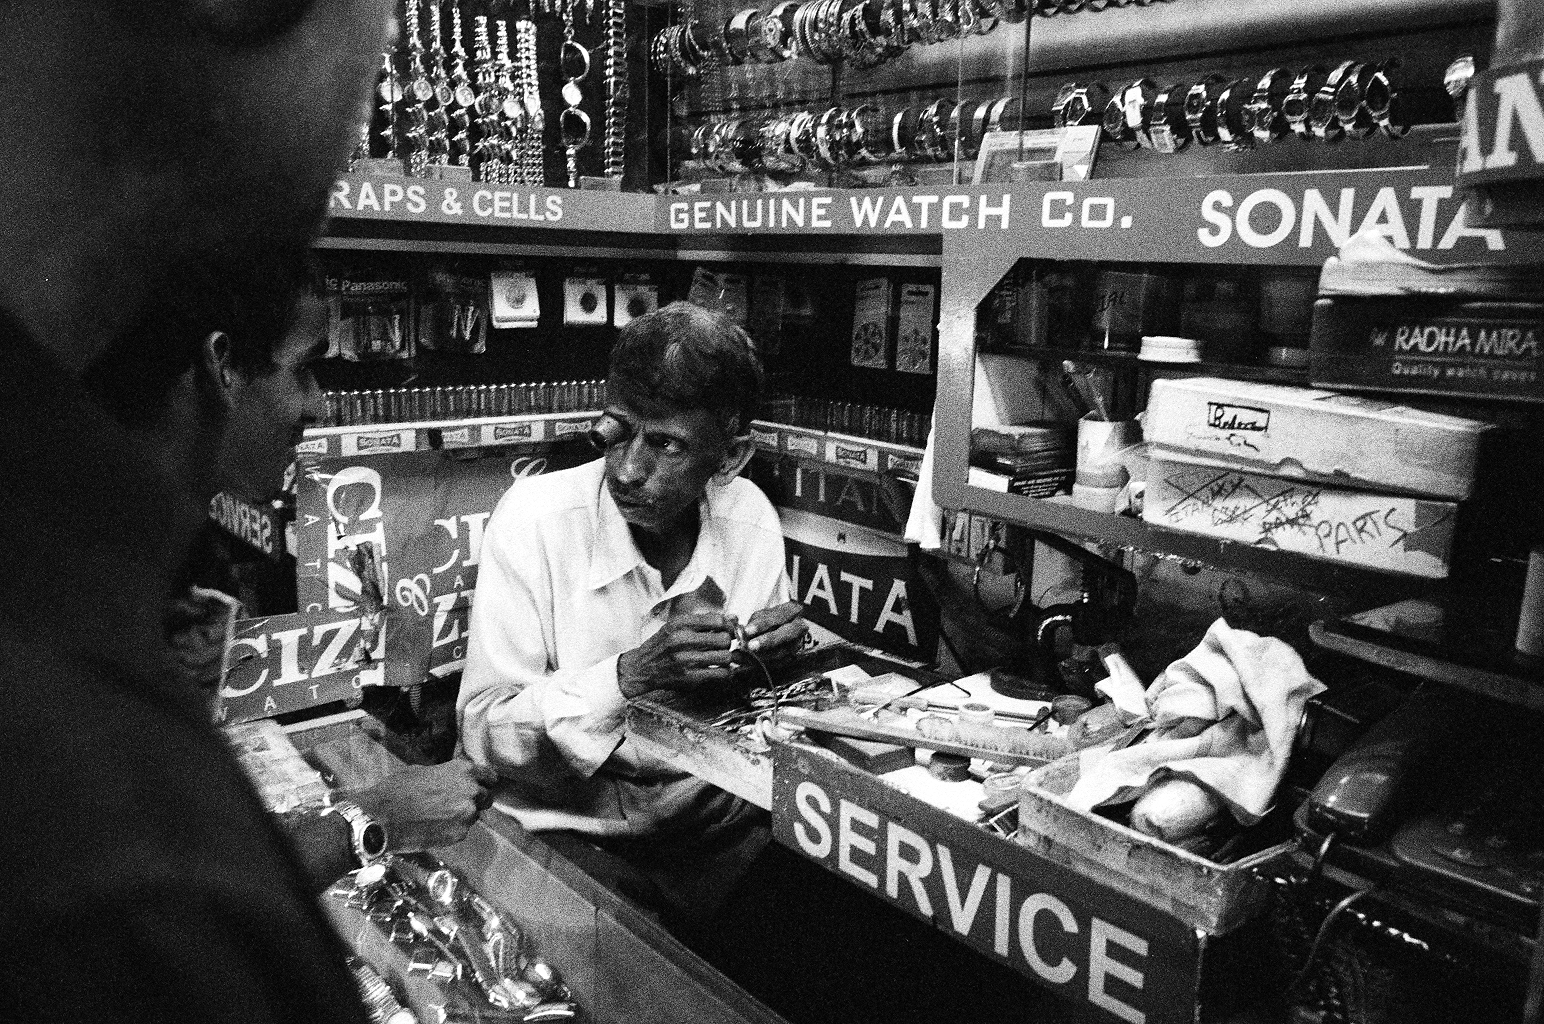 Watch Repair Shop / Hyderabad, India